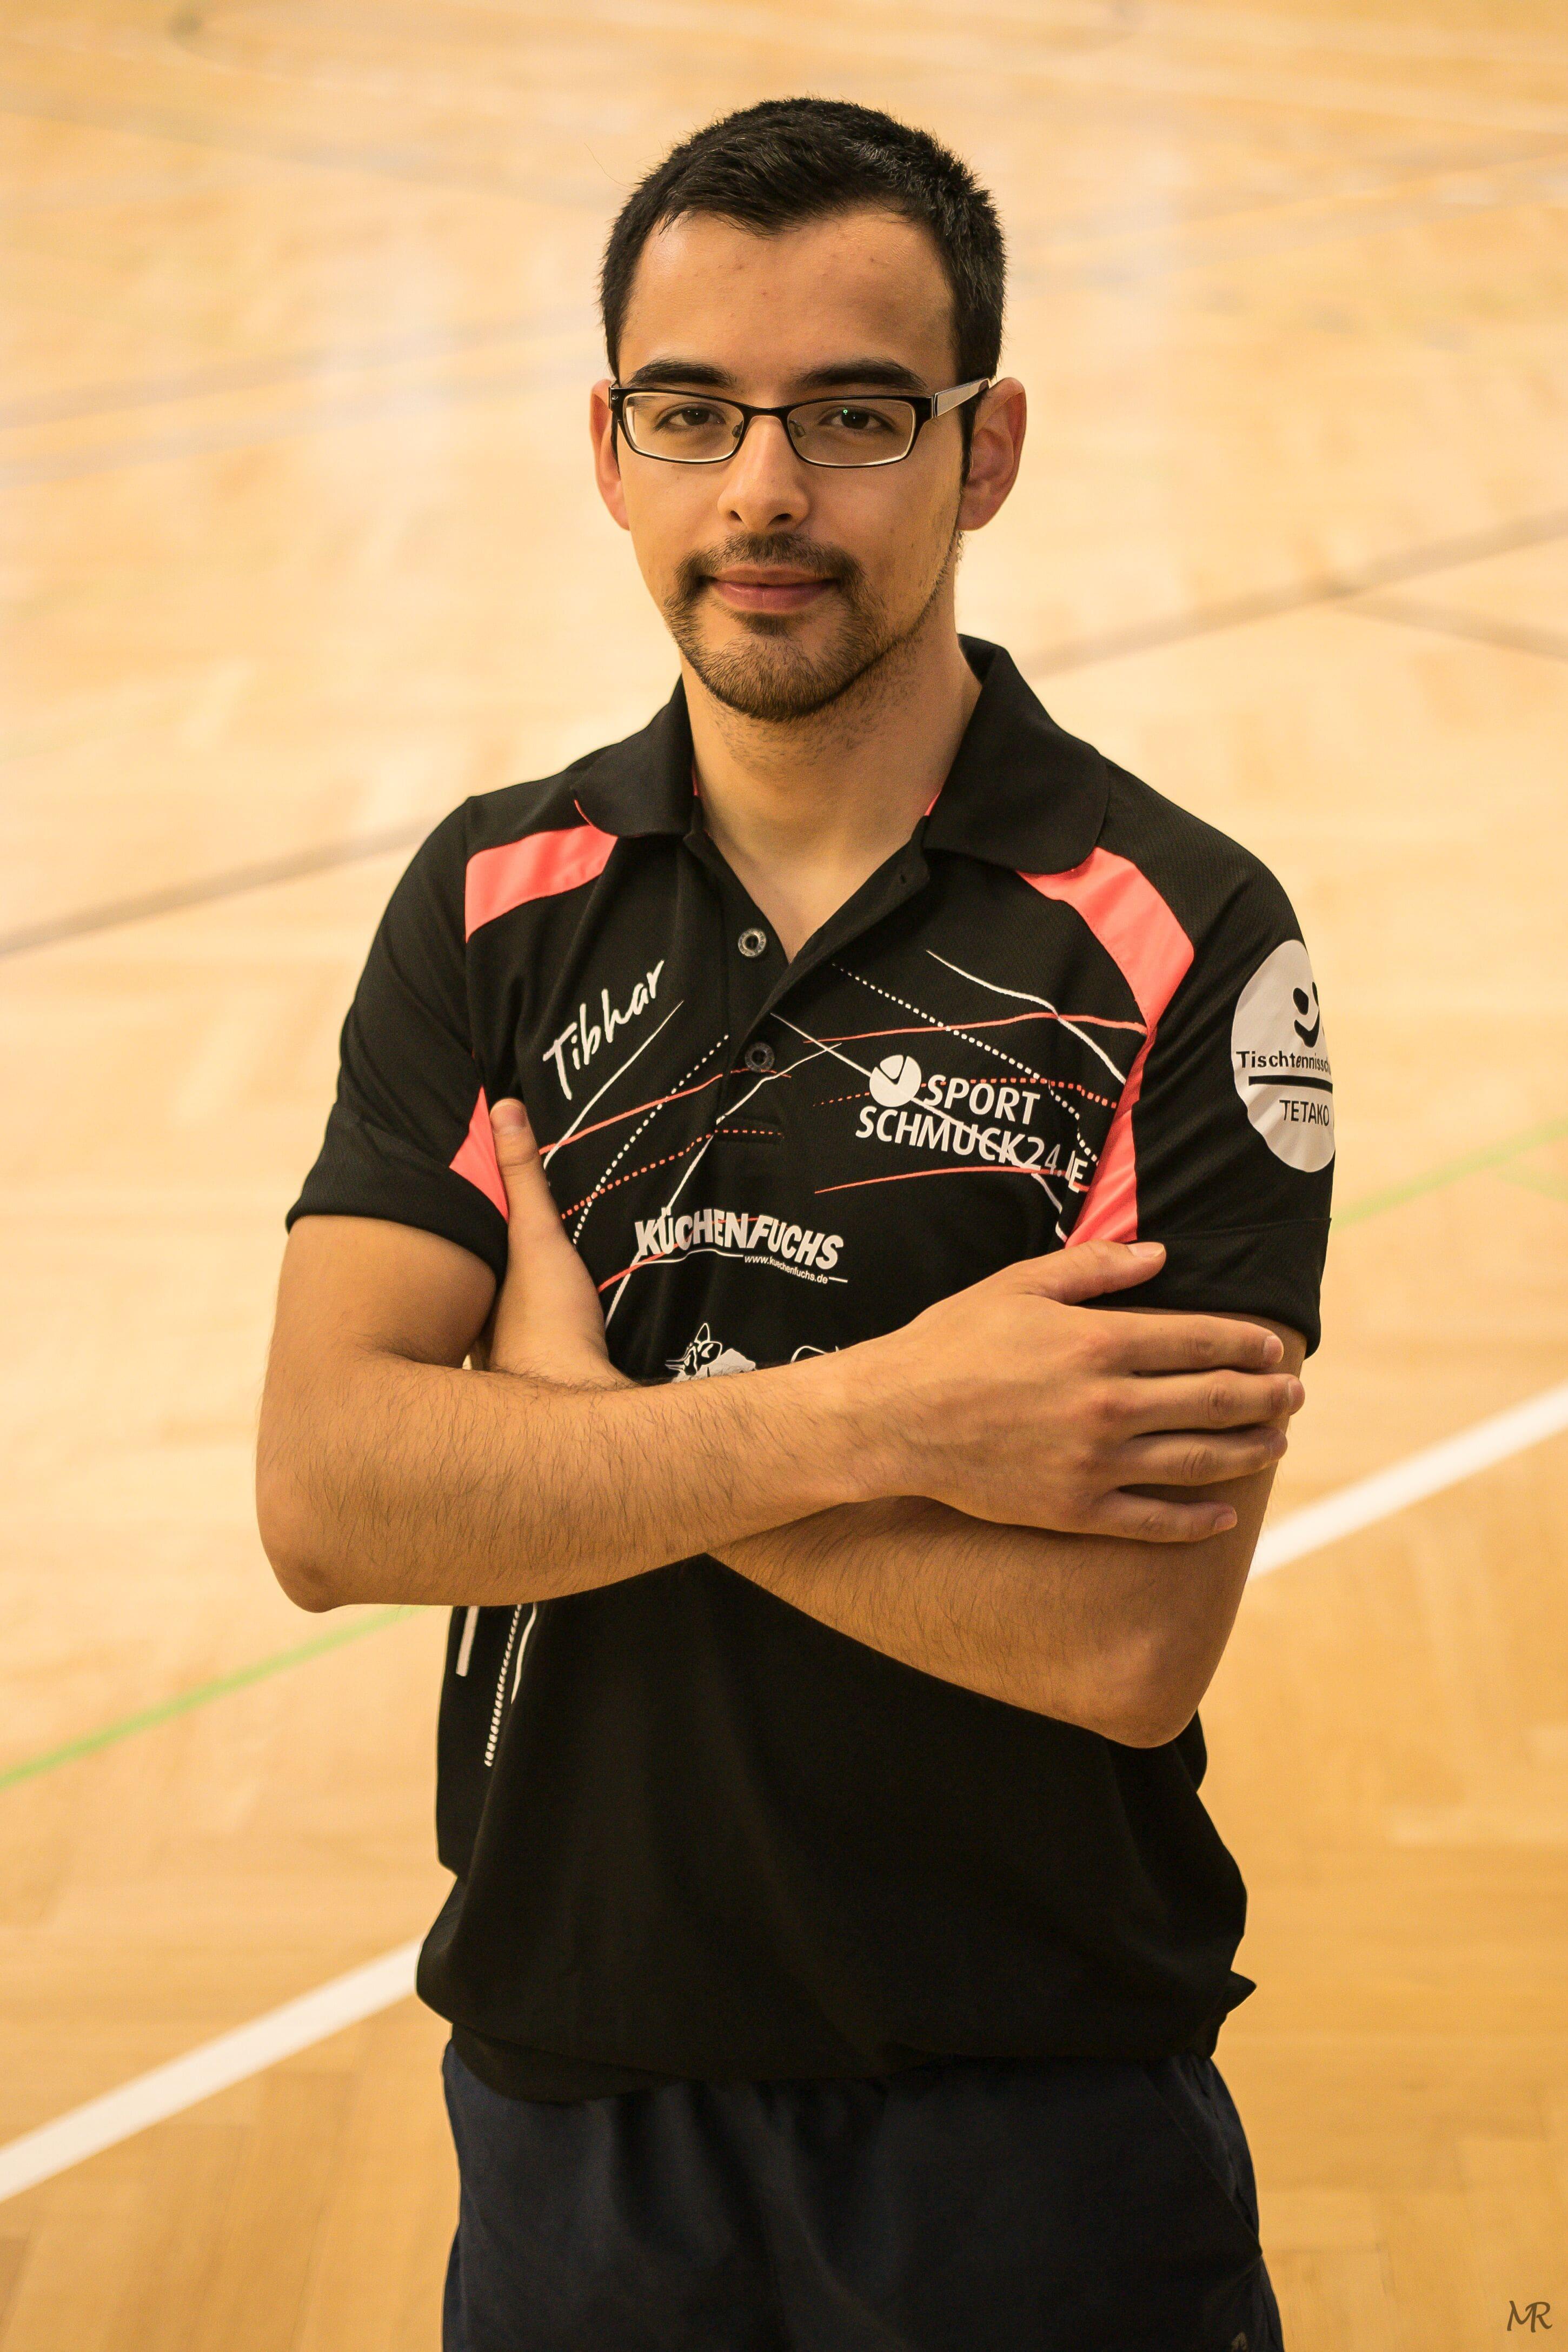 Hernan Benjamin Soto Torres